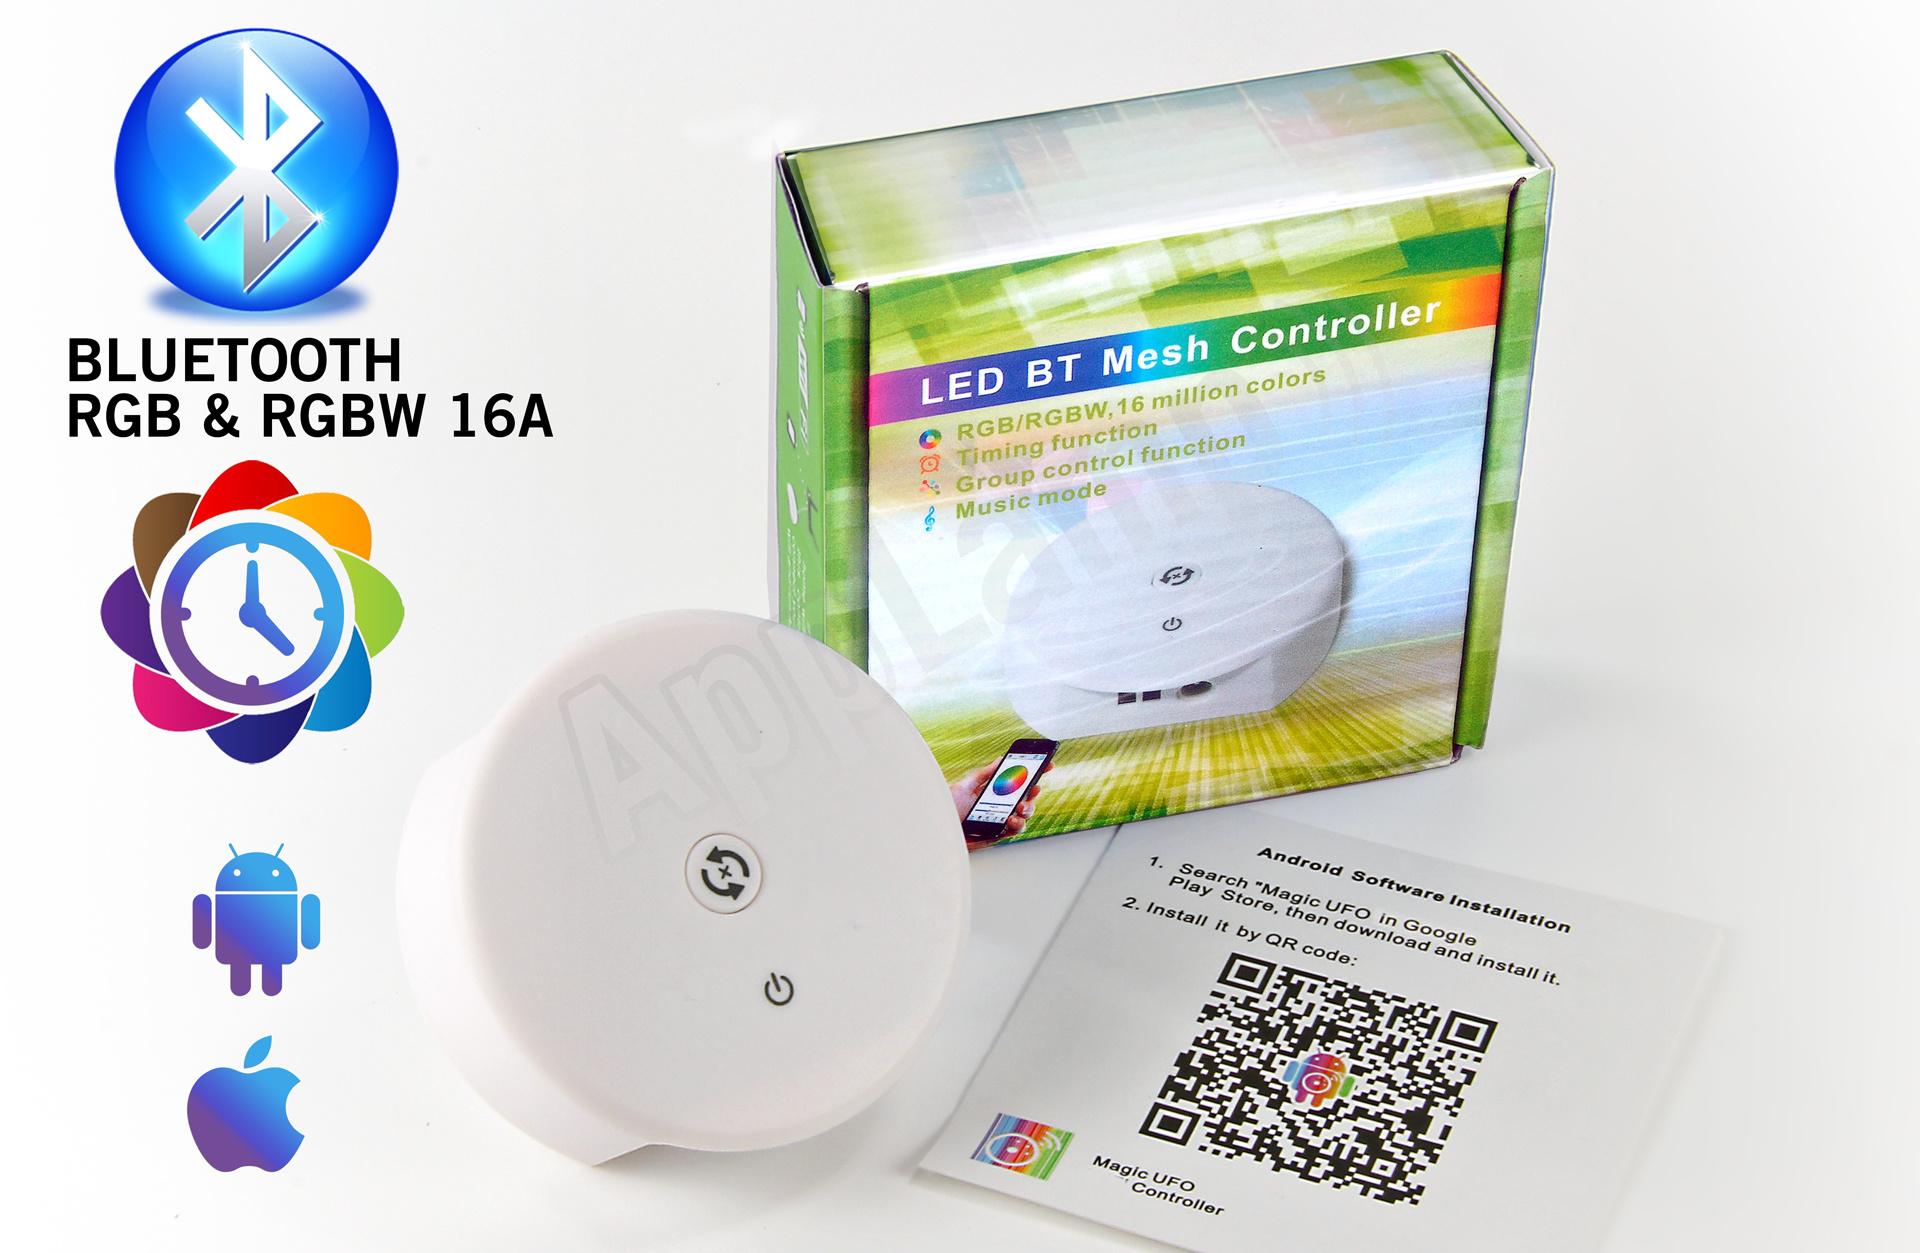 LED Magical Bluetooth RGB & RGBW controller met tijdklok timers!